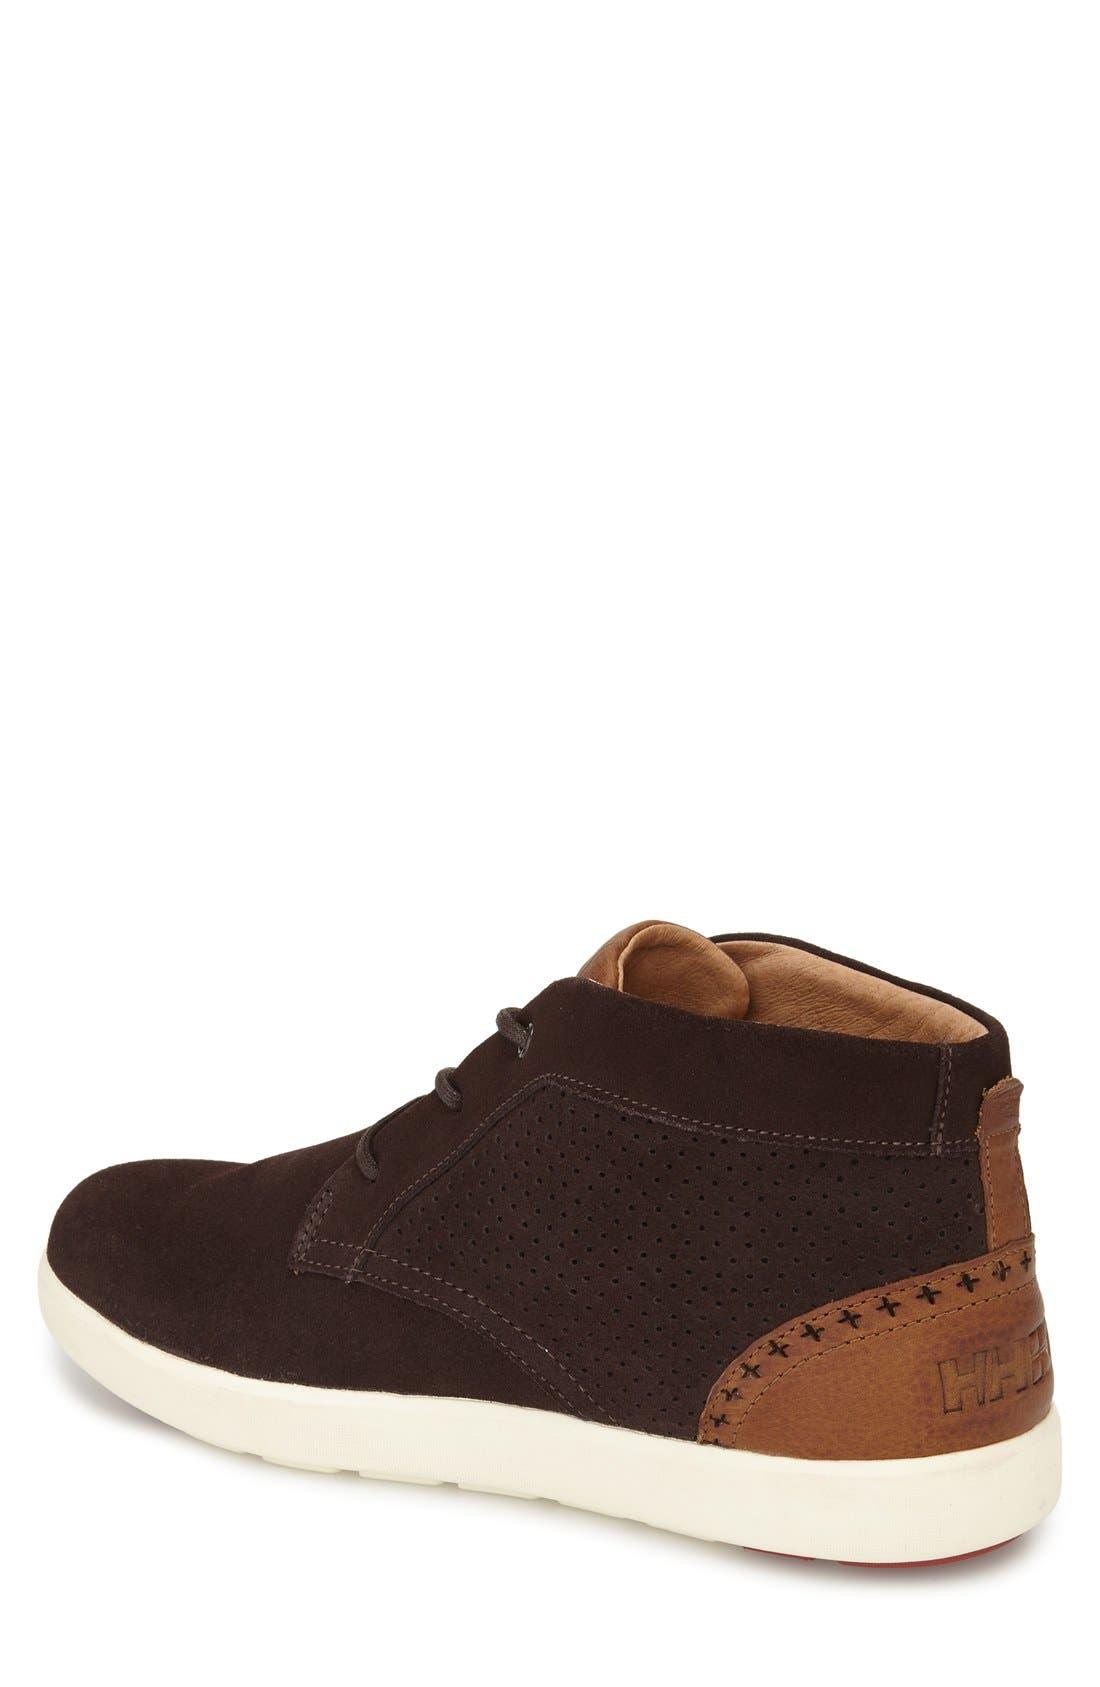 Alternate Image 2  - Helly Hansen 'Vigeland' Sneaker (Men)